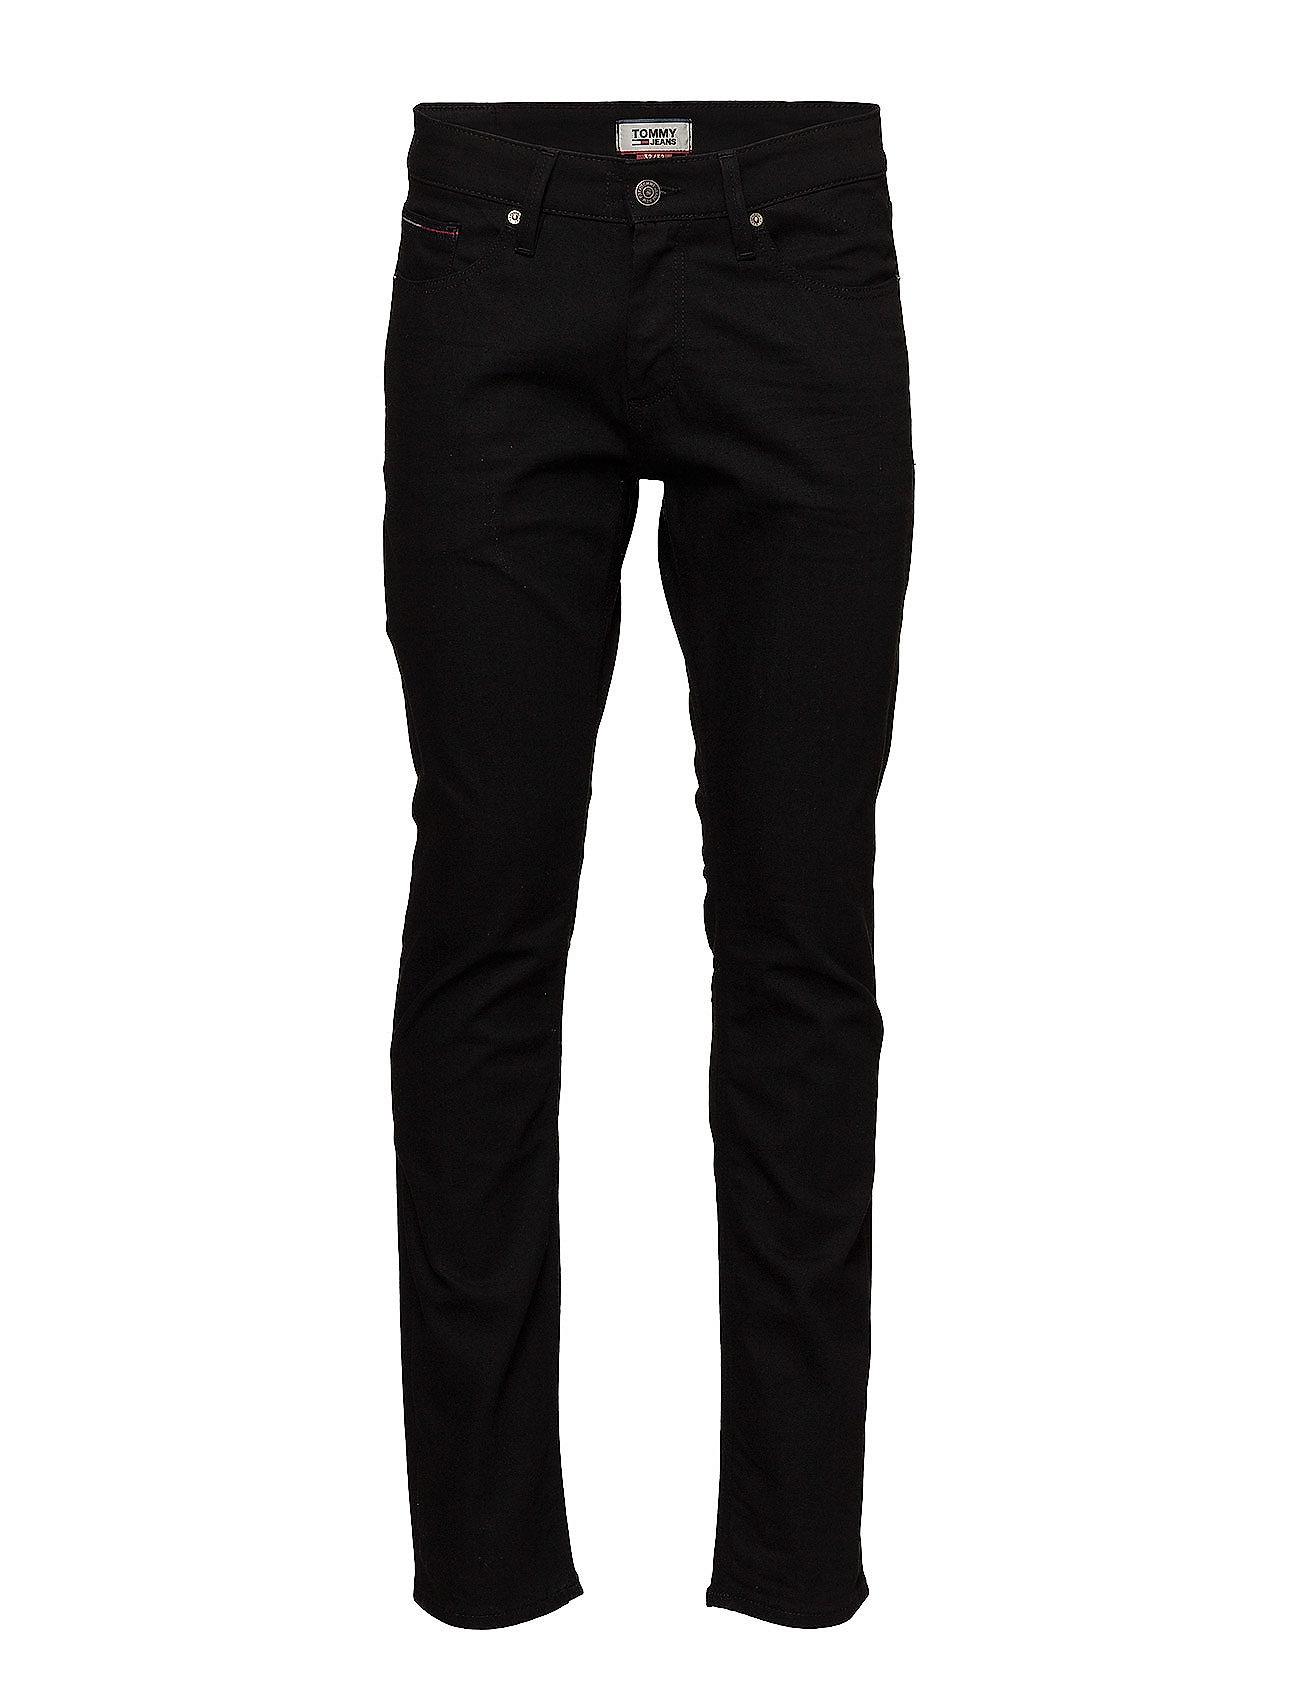 Tommy Jeans SLIM SCANTON BLCO, 0 - BLACK COMFORT